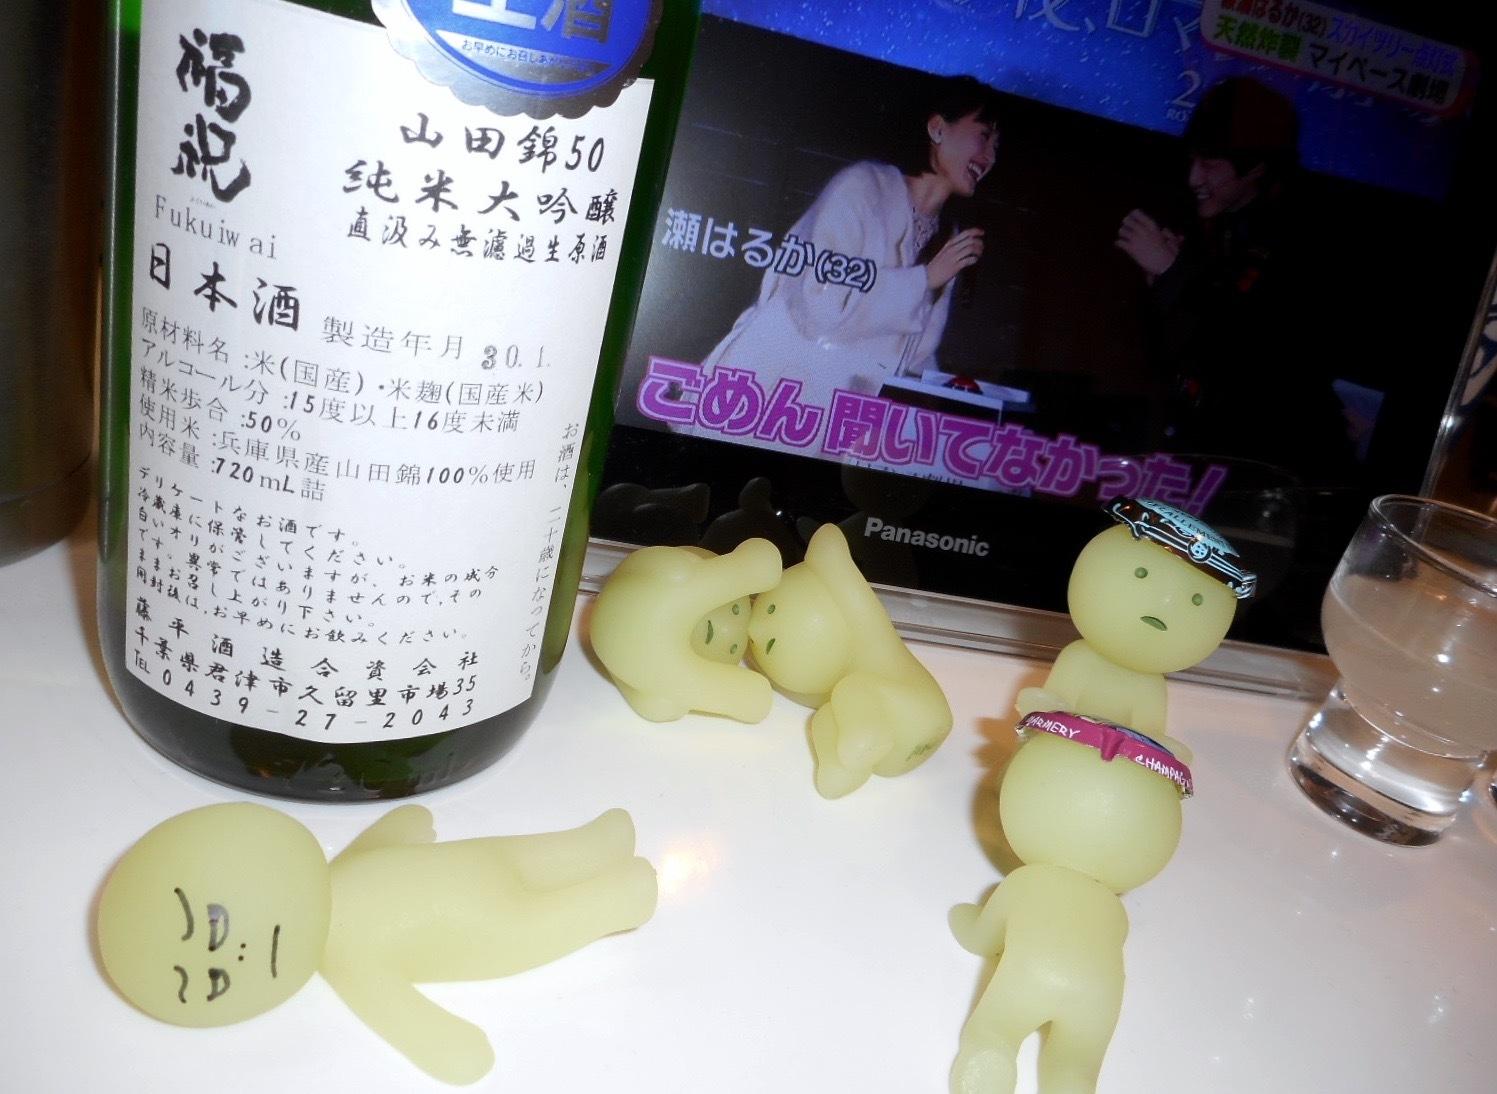 fukuiwai_yamada50jikagumi29by2.jpg